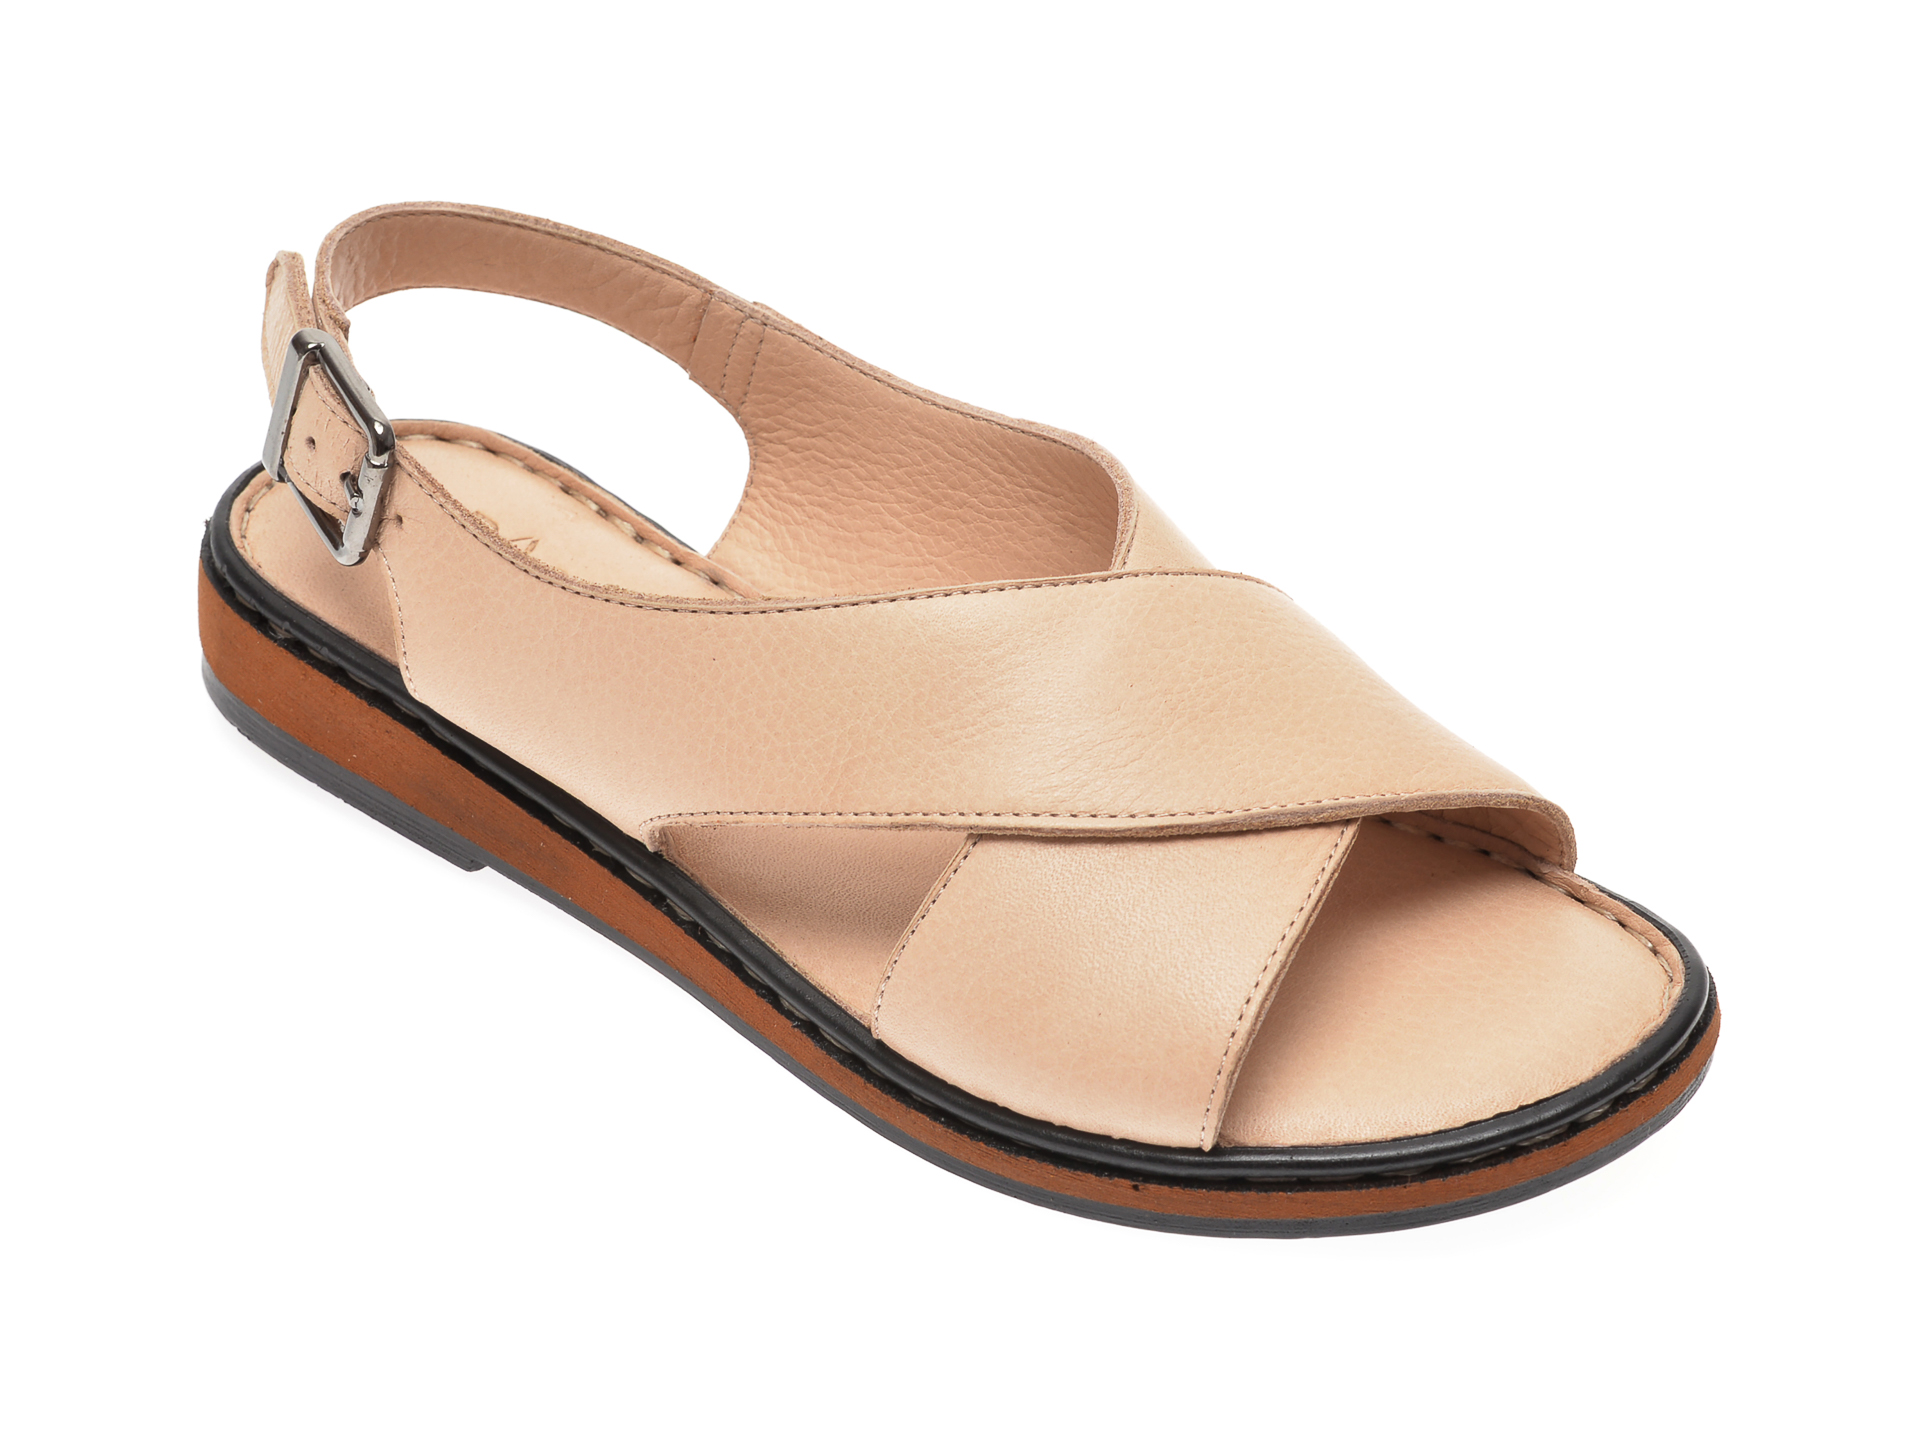 Sandale PASS COLLECTION bej, 1203, din piele naturala New